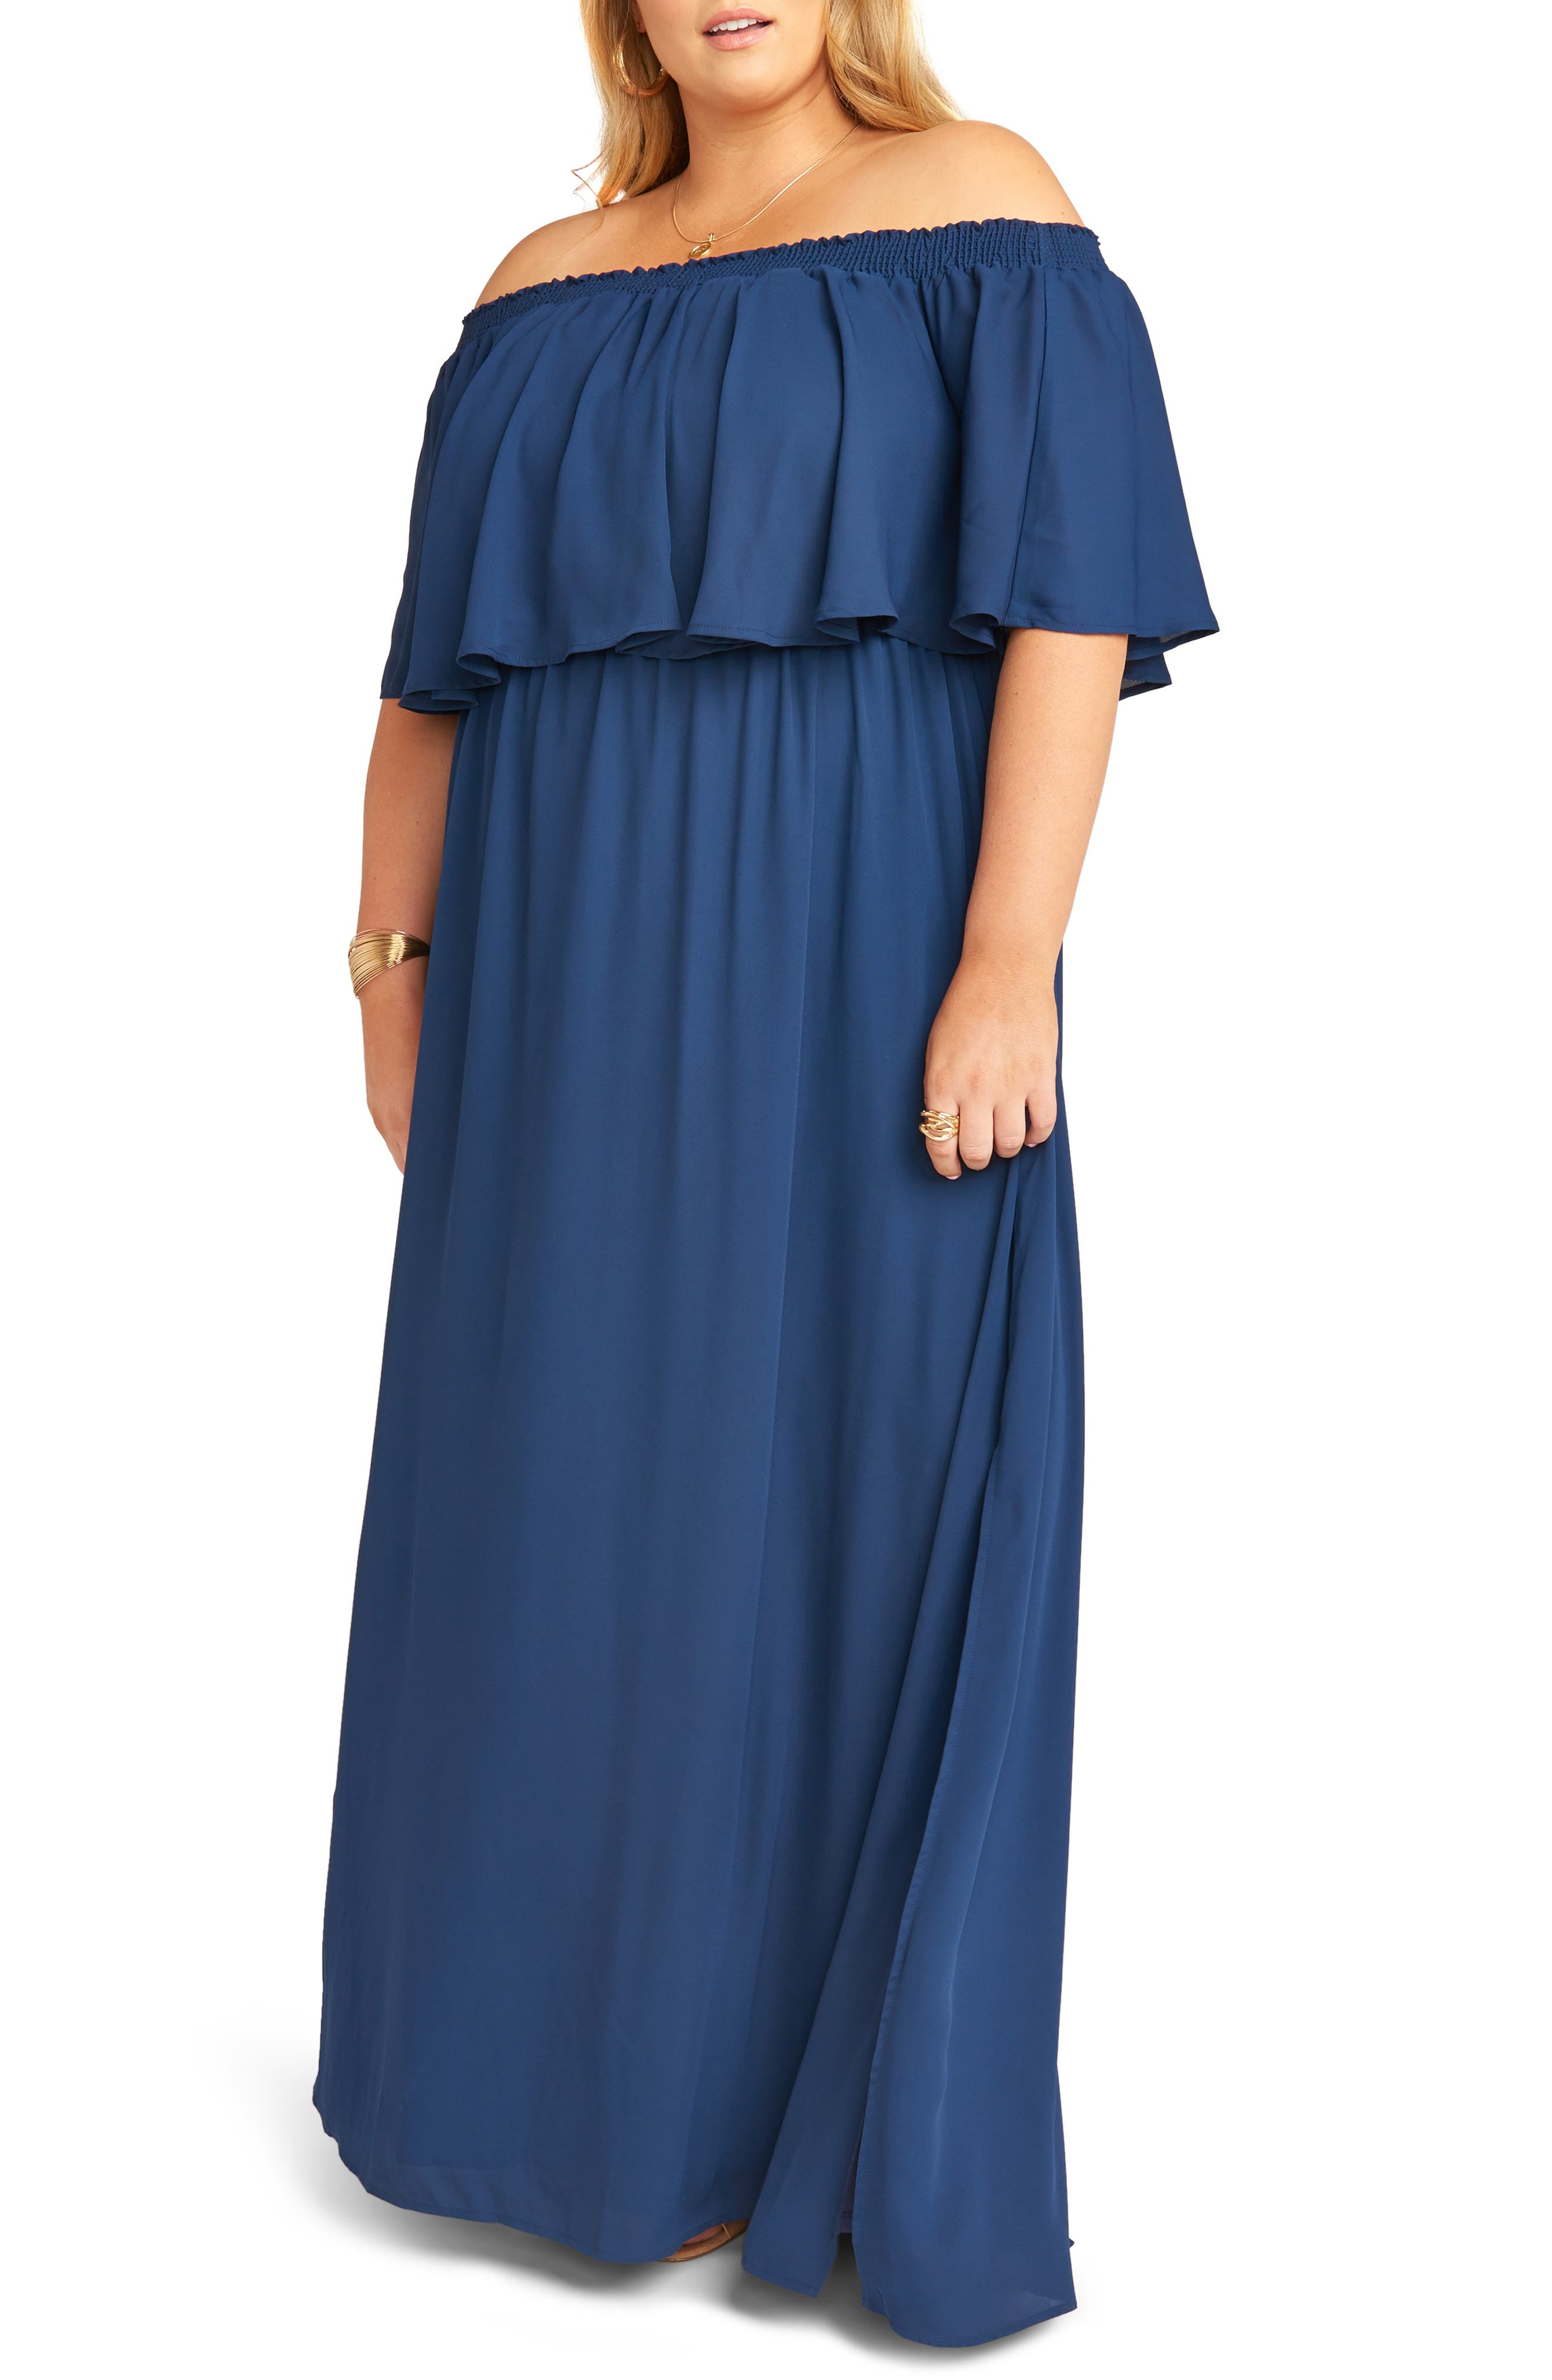 70s Dresses – Disco Dress, Hippie Dress, Wrap Dress Plus Size Womens Show Me Your Mumu Hacienda Off The Shoulder Ruffle Evening Dress Size 1X - Blue $172.00 AT vintagedancer.com